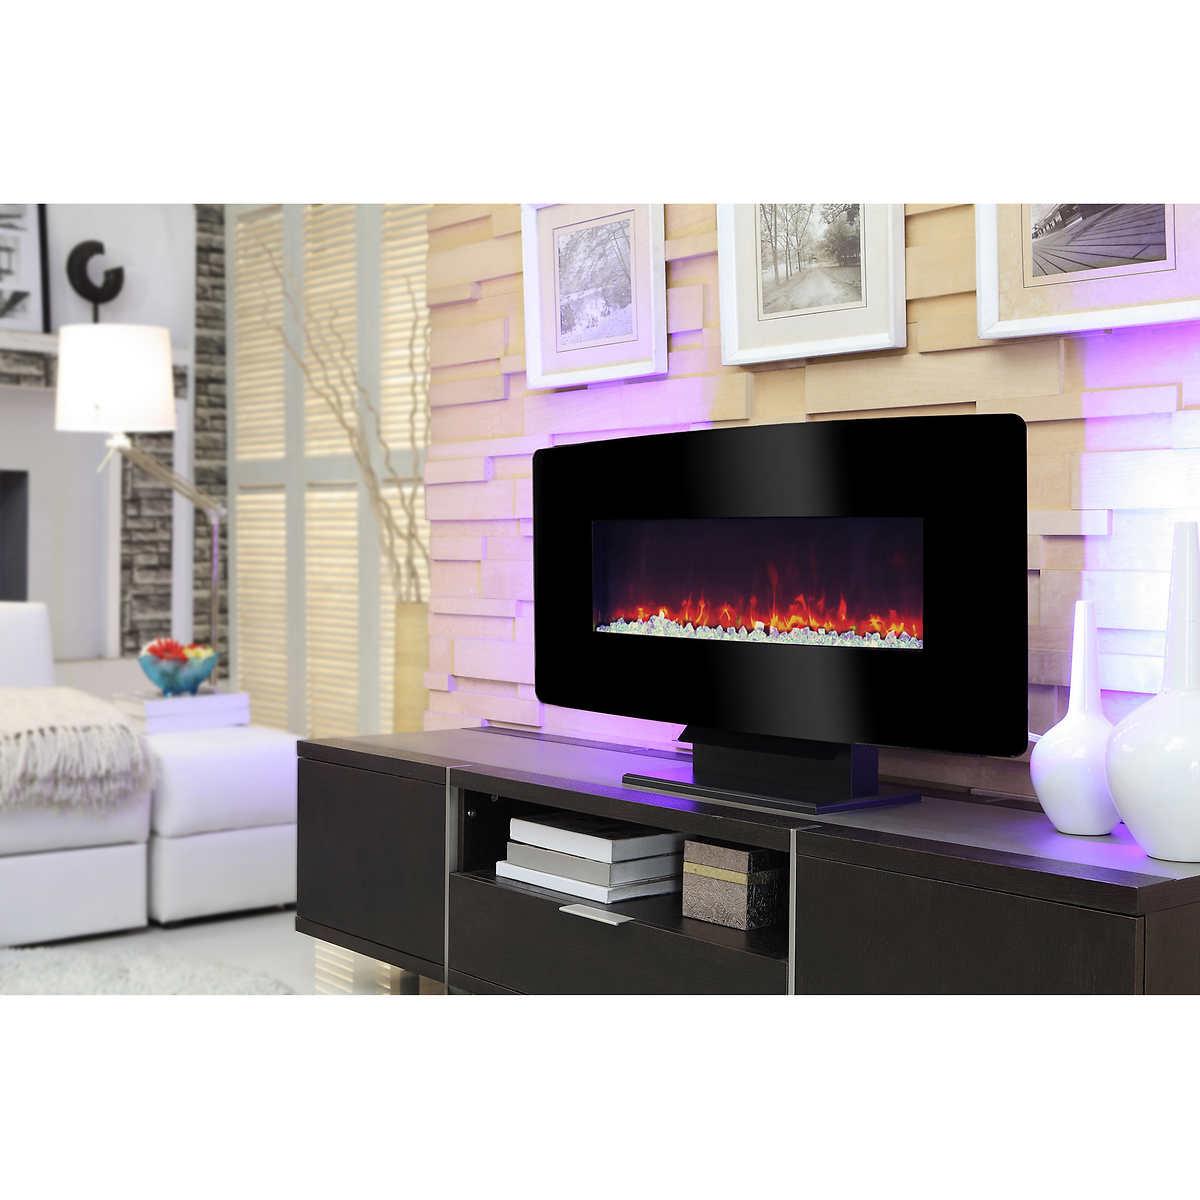 Muskoka Electric Fireplaces Costco - Costco electric fireplace